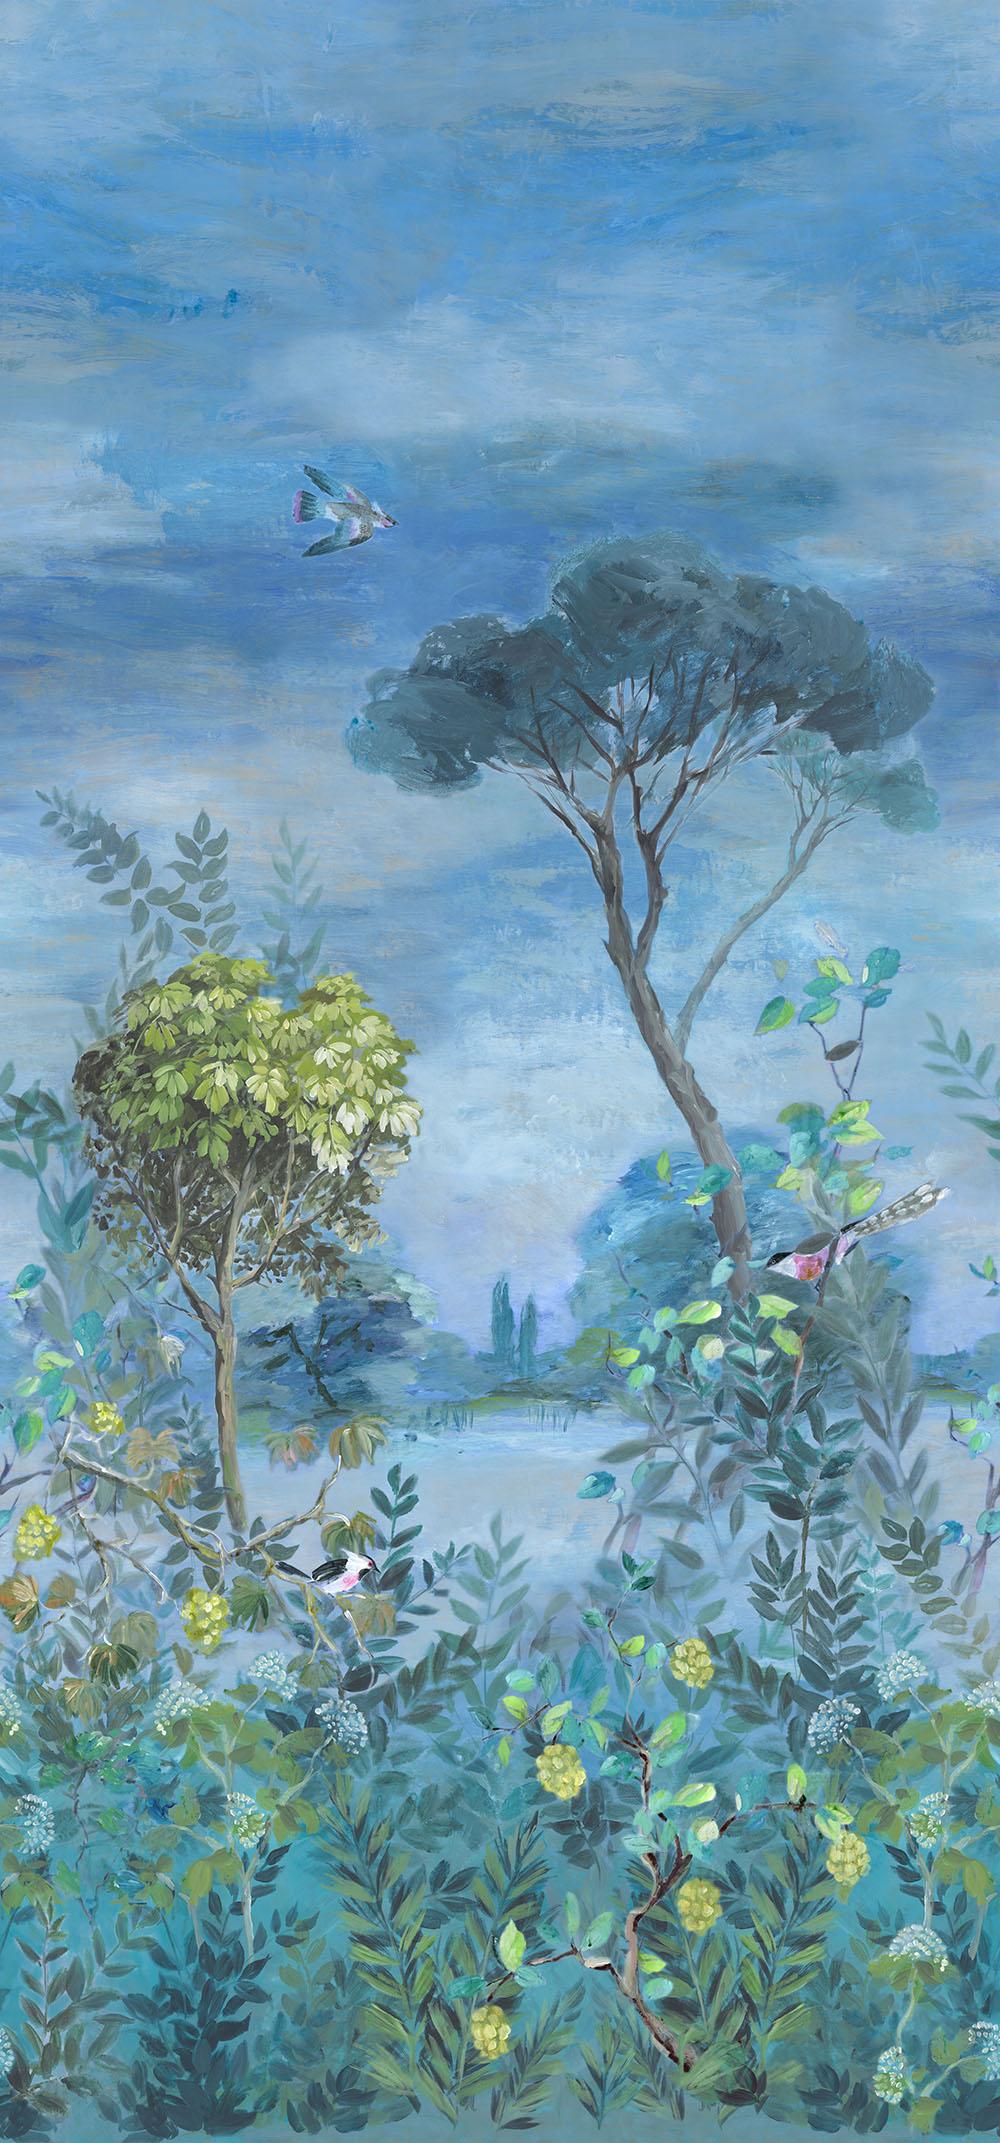 Giardino Segreto Scene 1 Mural - Multi - by Designers Guild